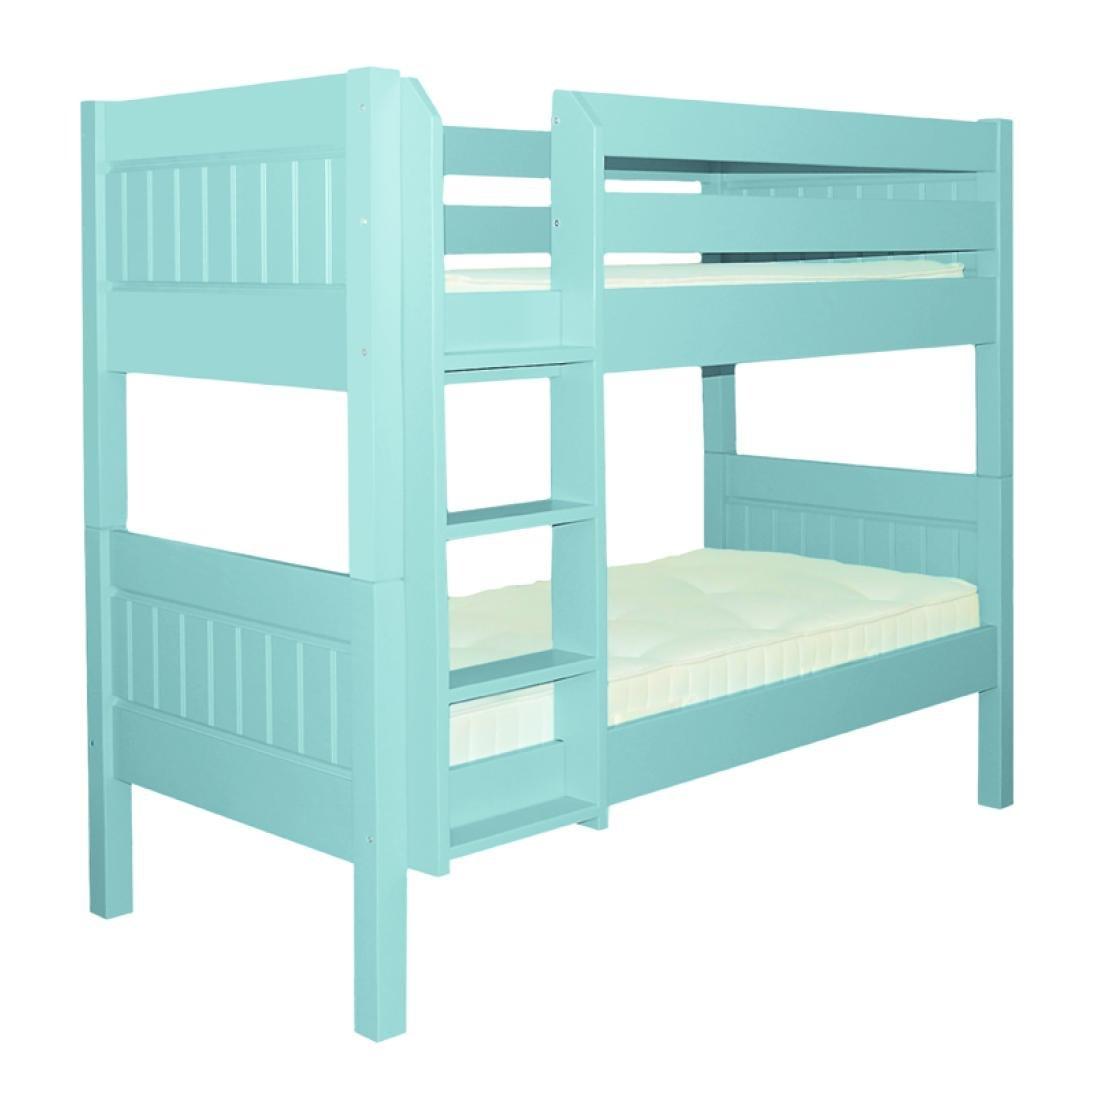 Padstow Childrens Bunk Bed Childrens Bedroom Furniture Uk